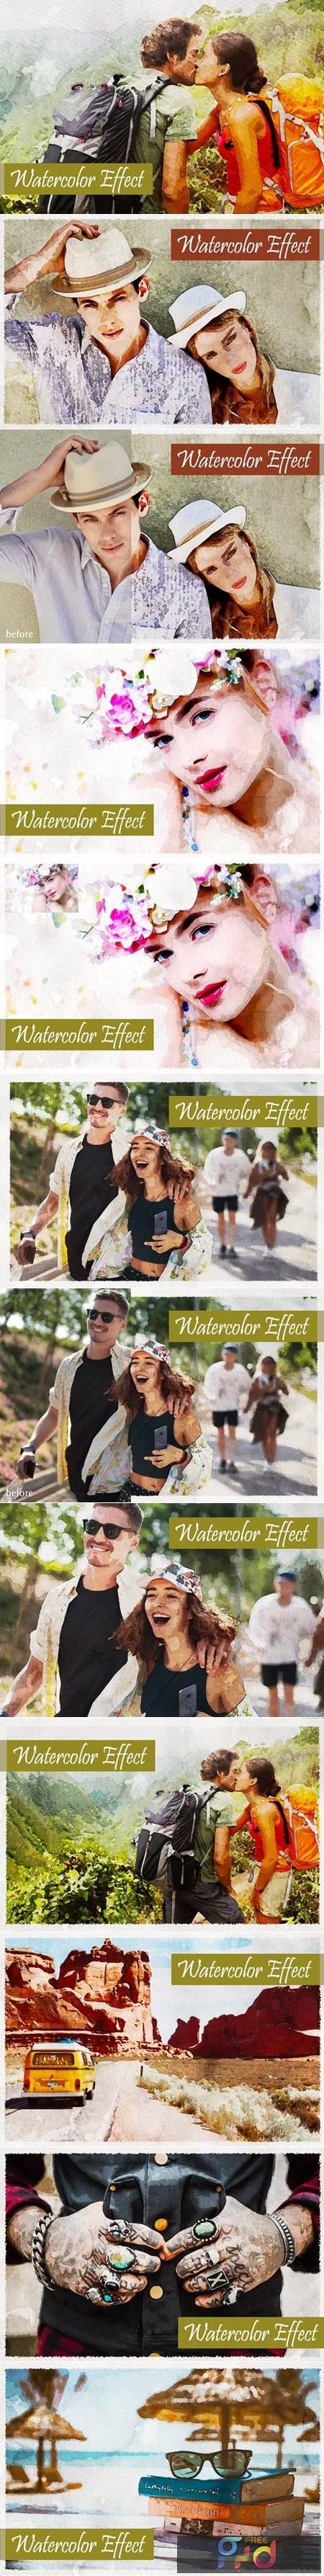 Watercolor Effect 5056838 1